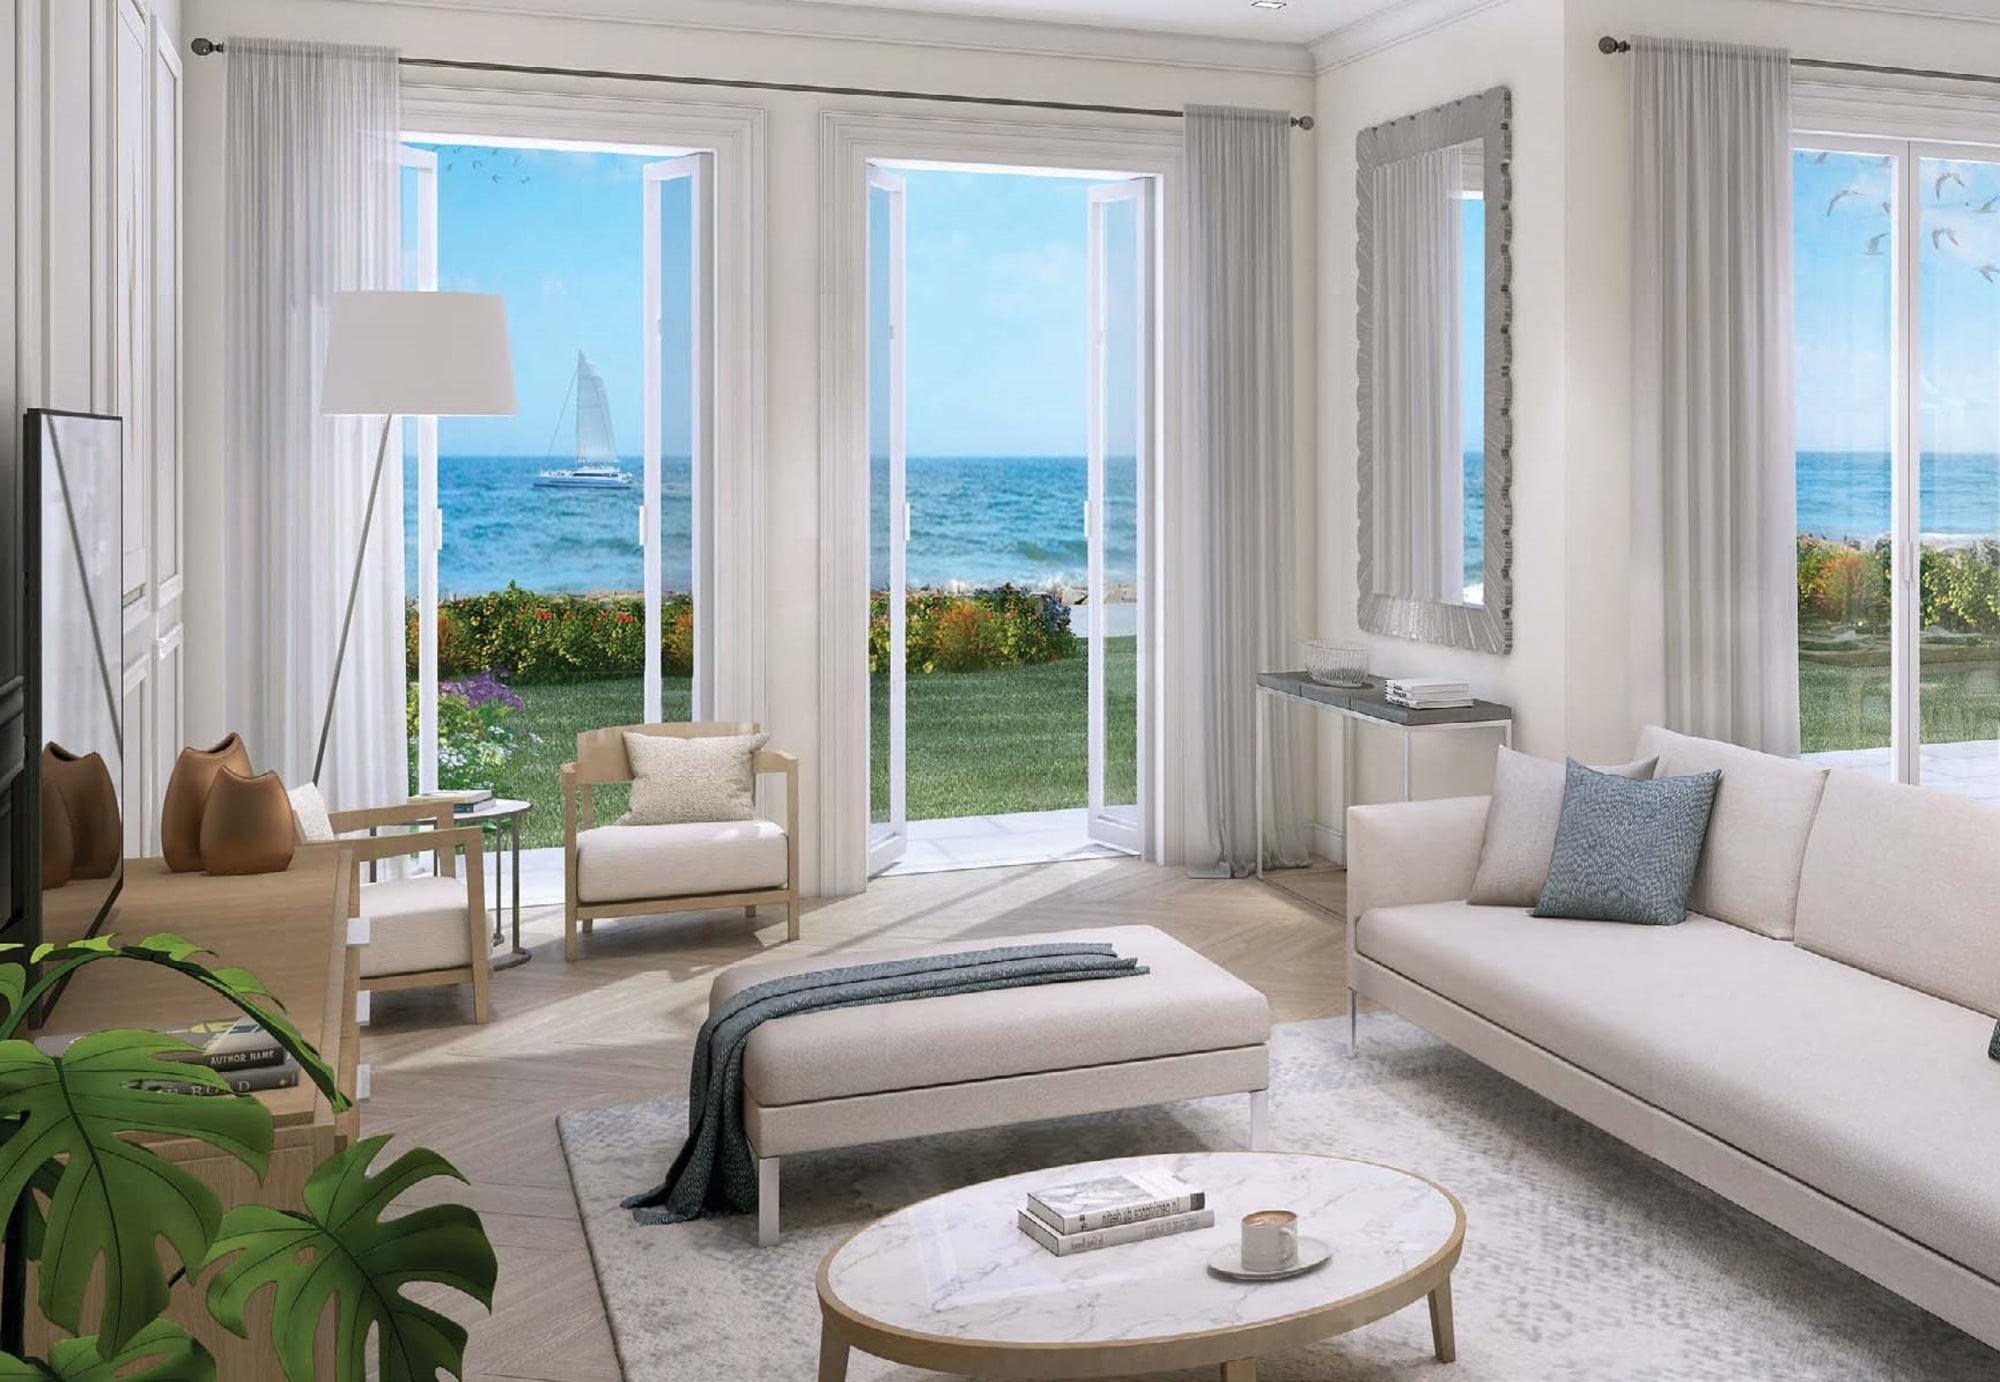 Magnificent View | 4 Bedroom Townhouse | Sur Lamer